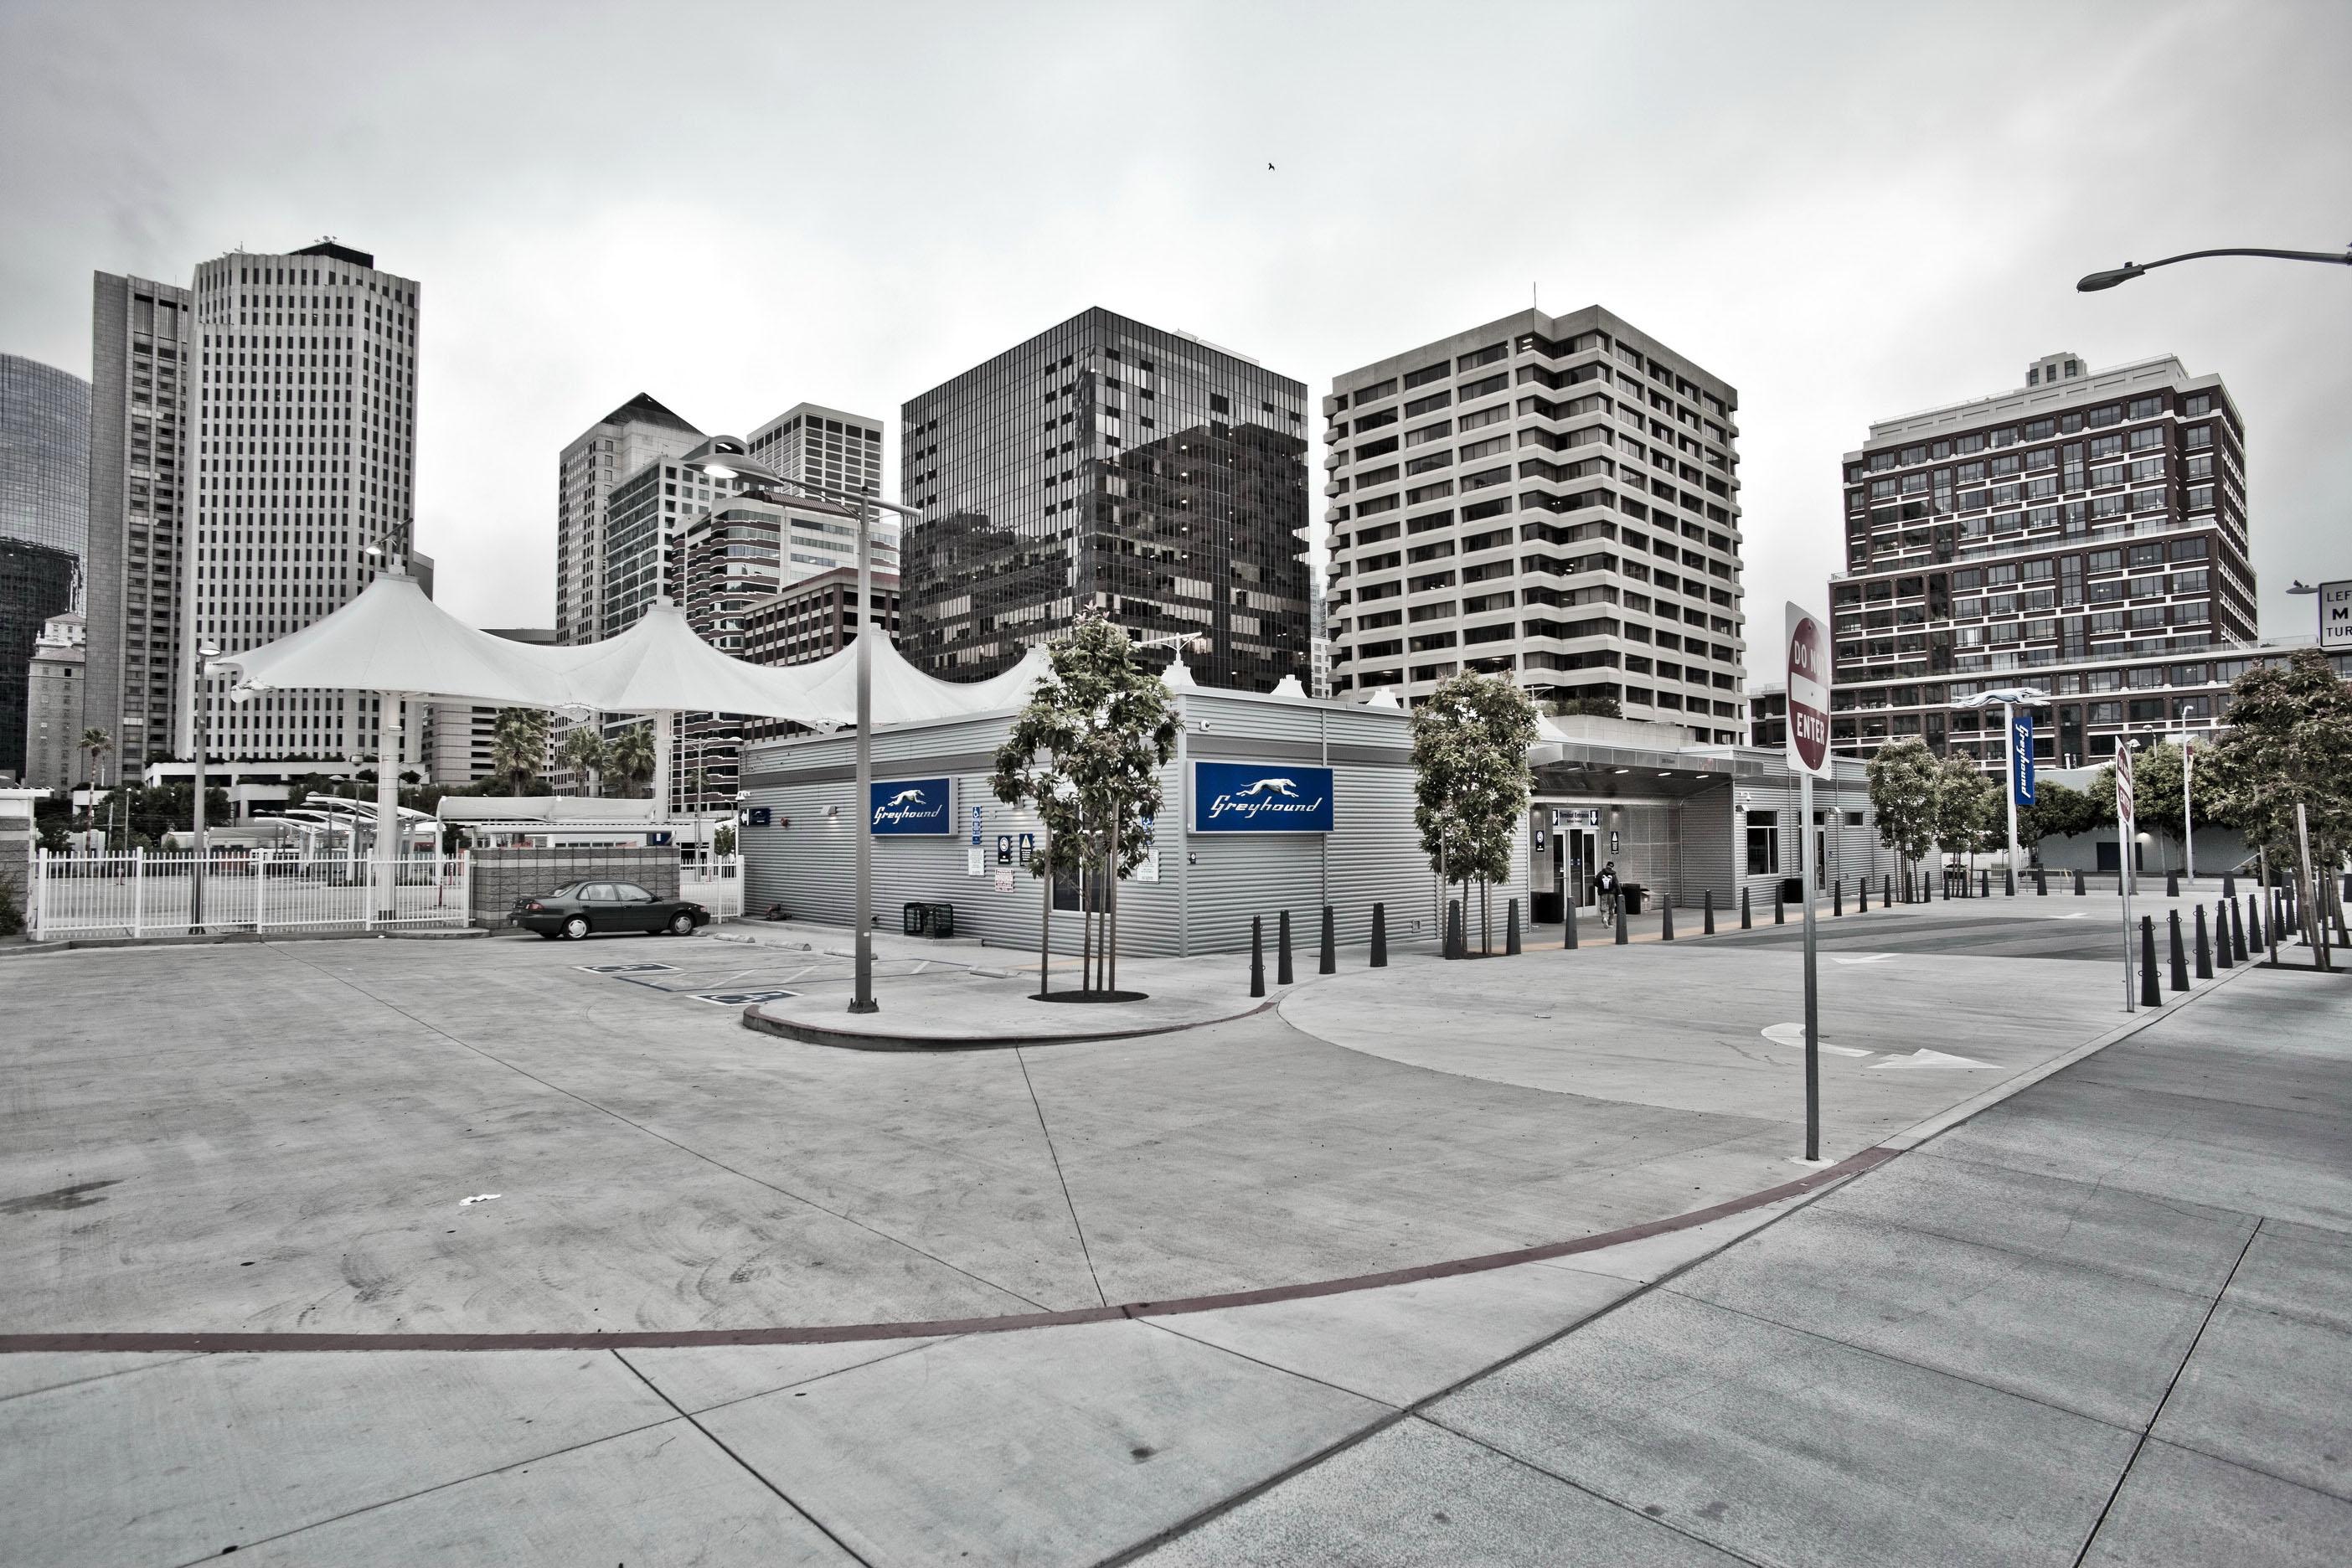 Architecture Grayhound Terminal along Folsom St San Francisco CA July 2011 02